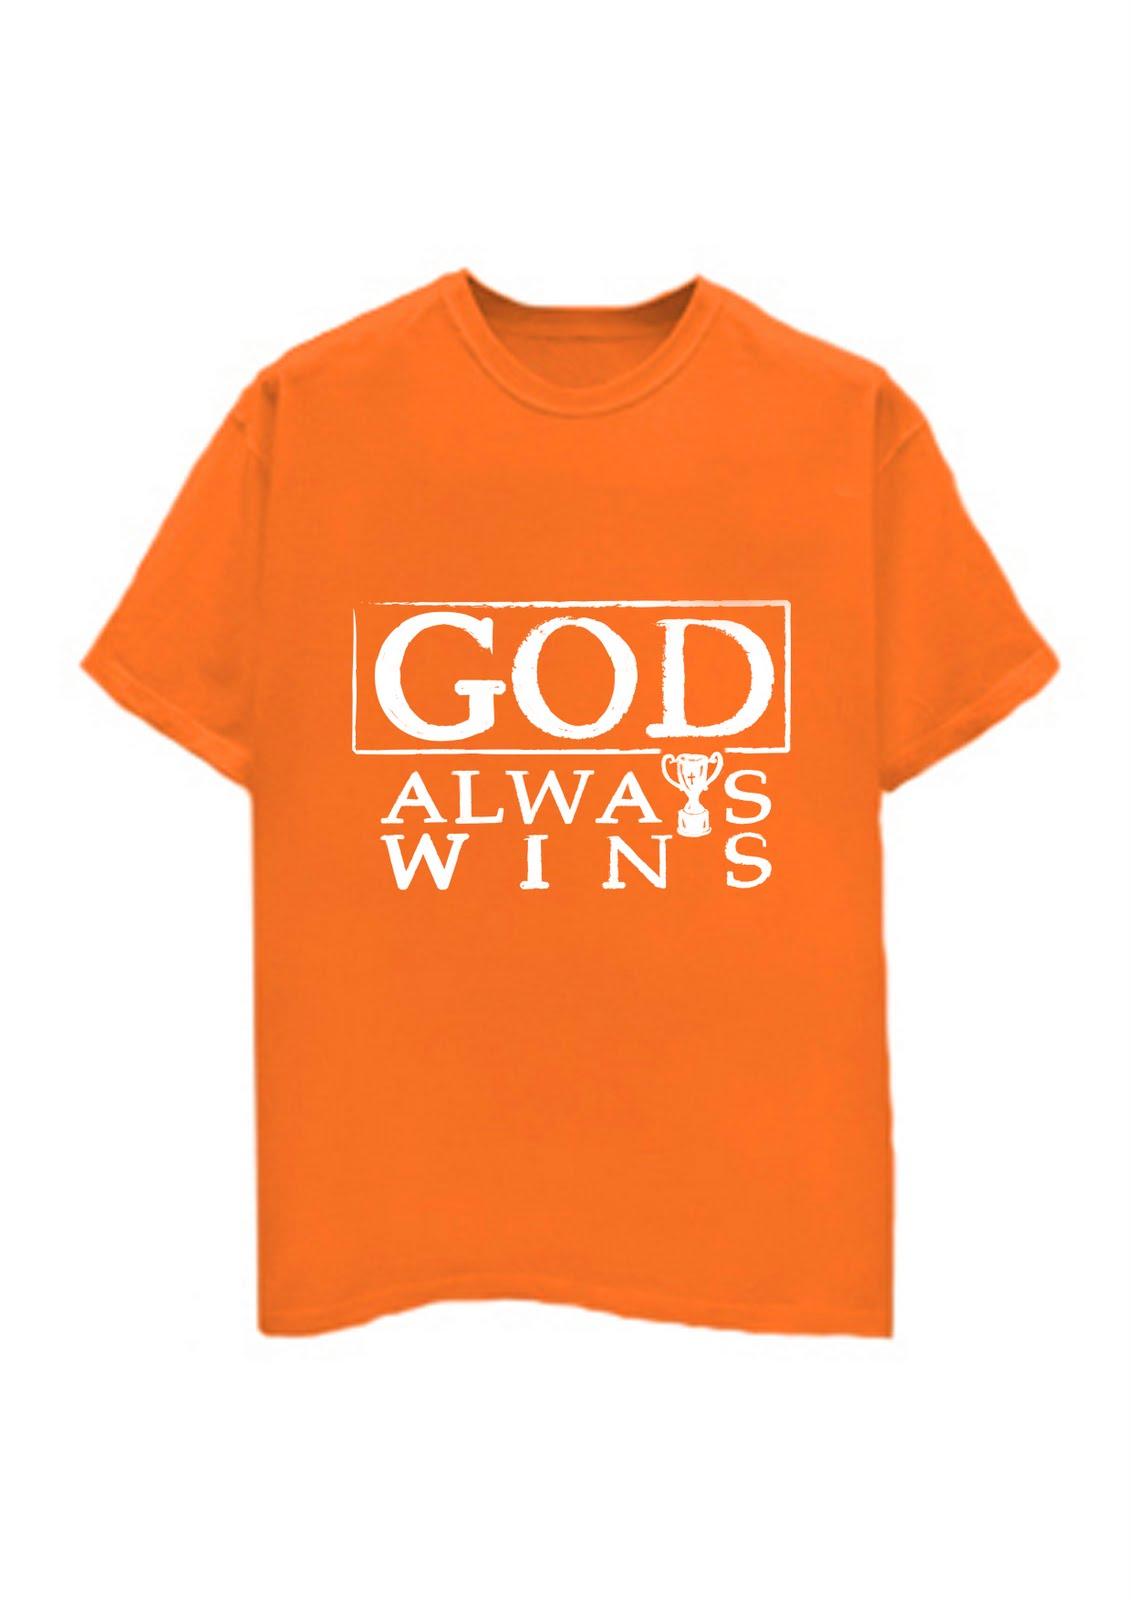 b i g c o w d e s i g n s t shirt design children 39 s